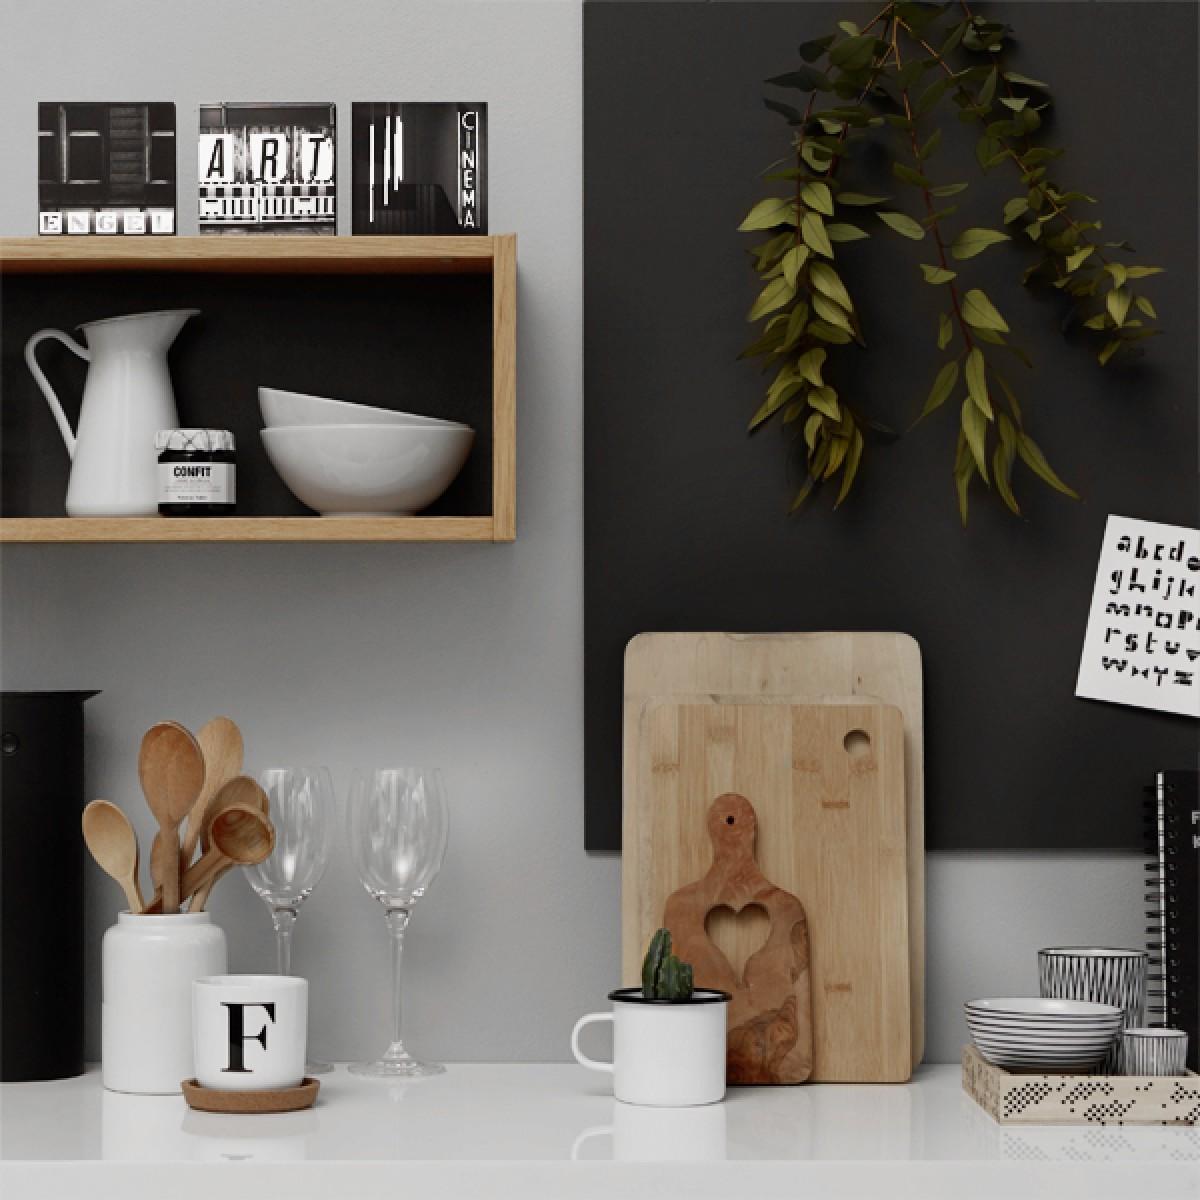 FrankfurterBubb THAT LOVES Limited Edition  schwarz-weiß Foto-Kachel